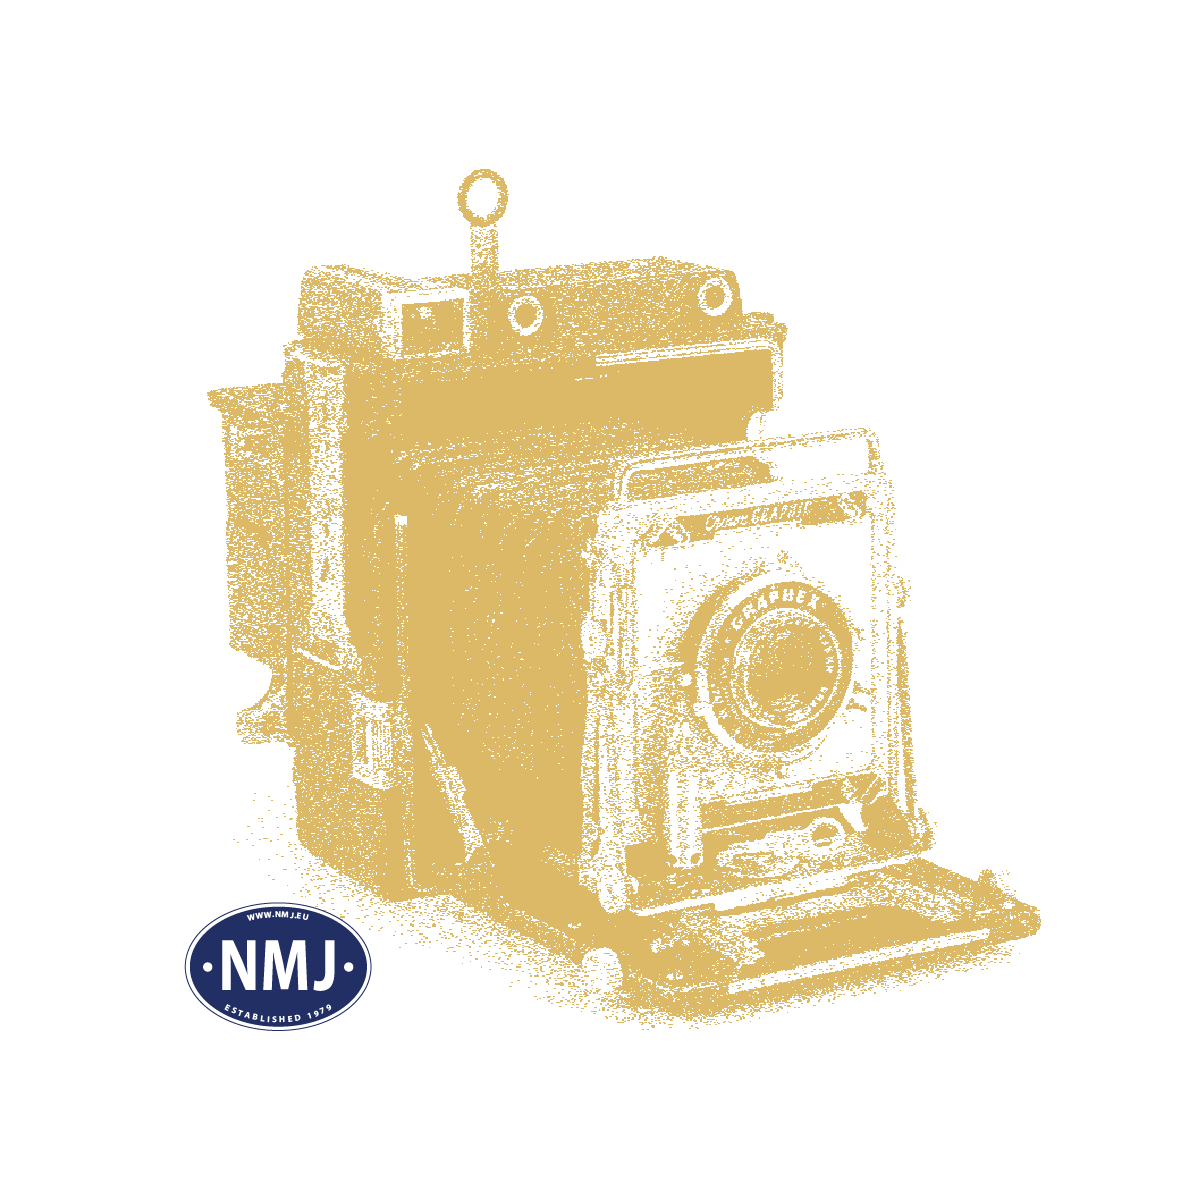 NMJT245301 - NMJ Topline CFL 1601, 0-Skala, DCC m/ Lyd